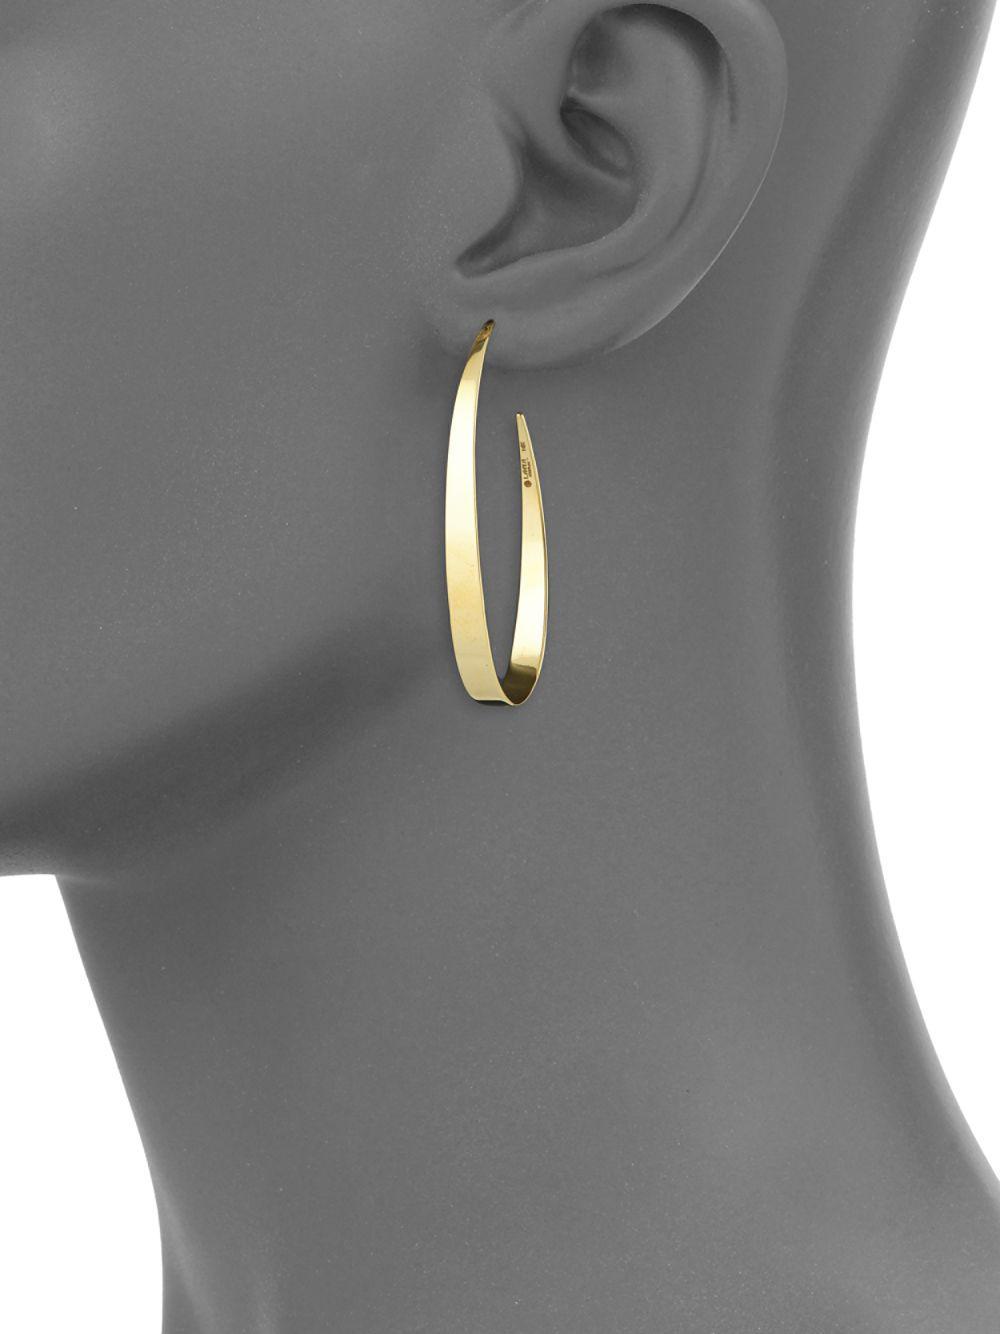 Lana Jewelry Small Gloss 14K Gold Hoop Earrings hASIYpTV